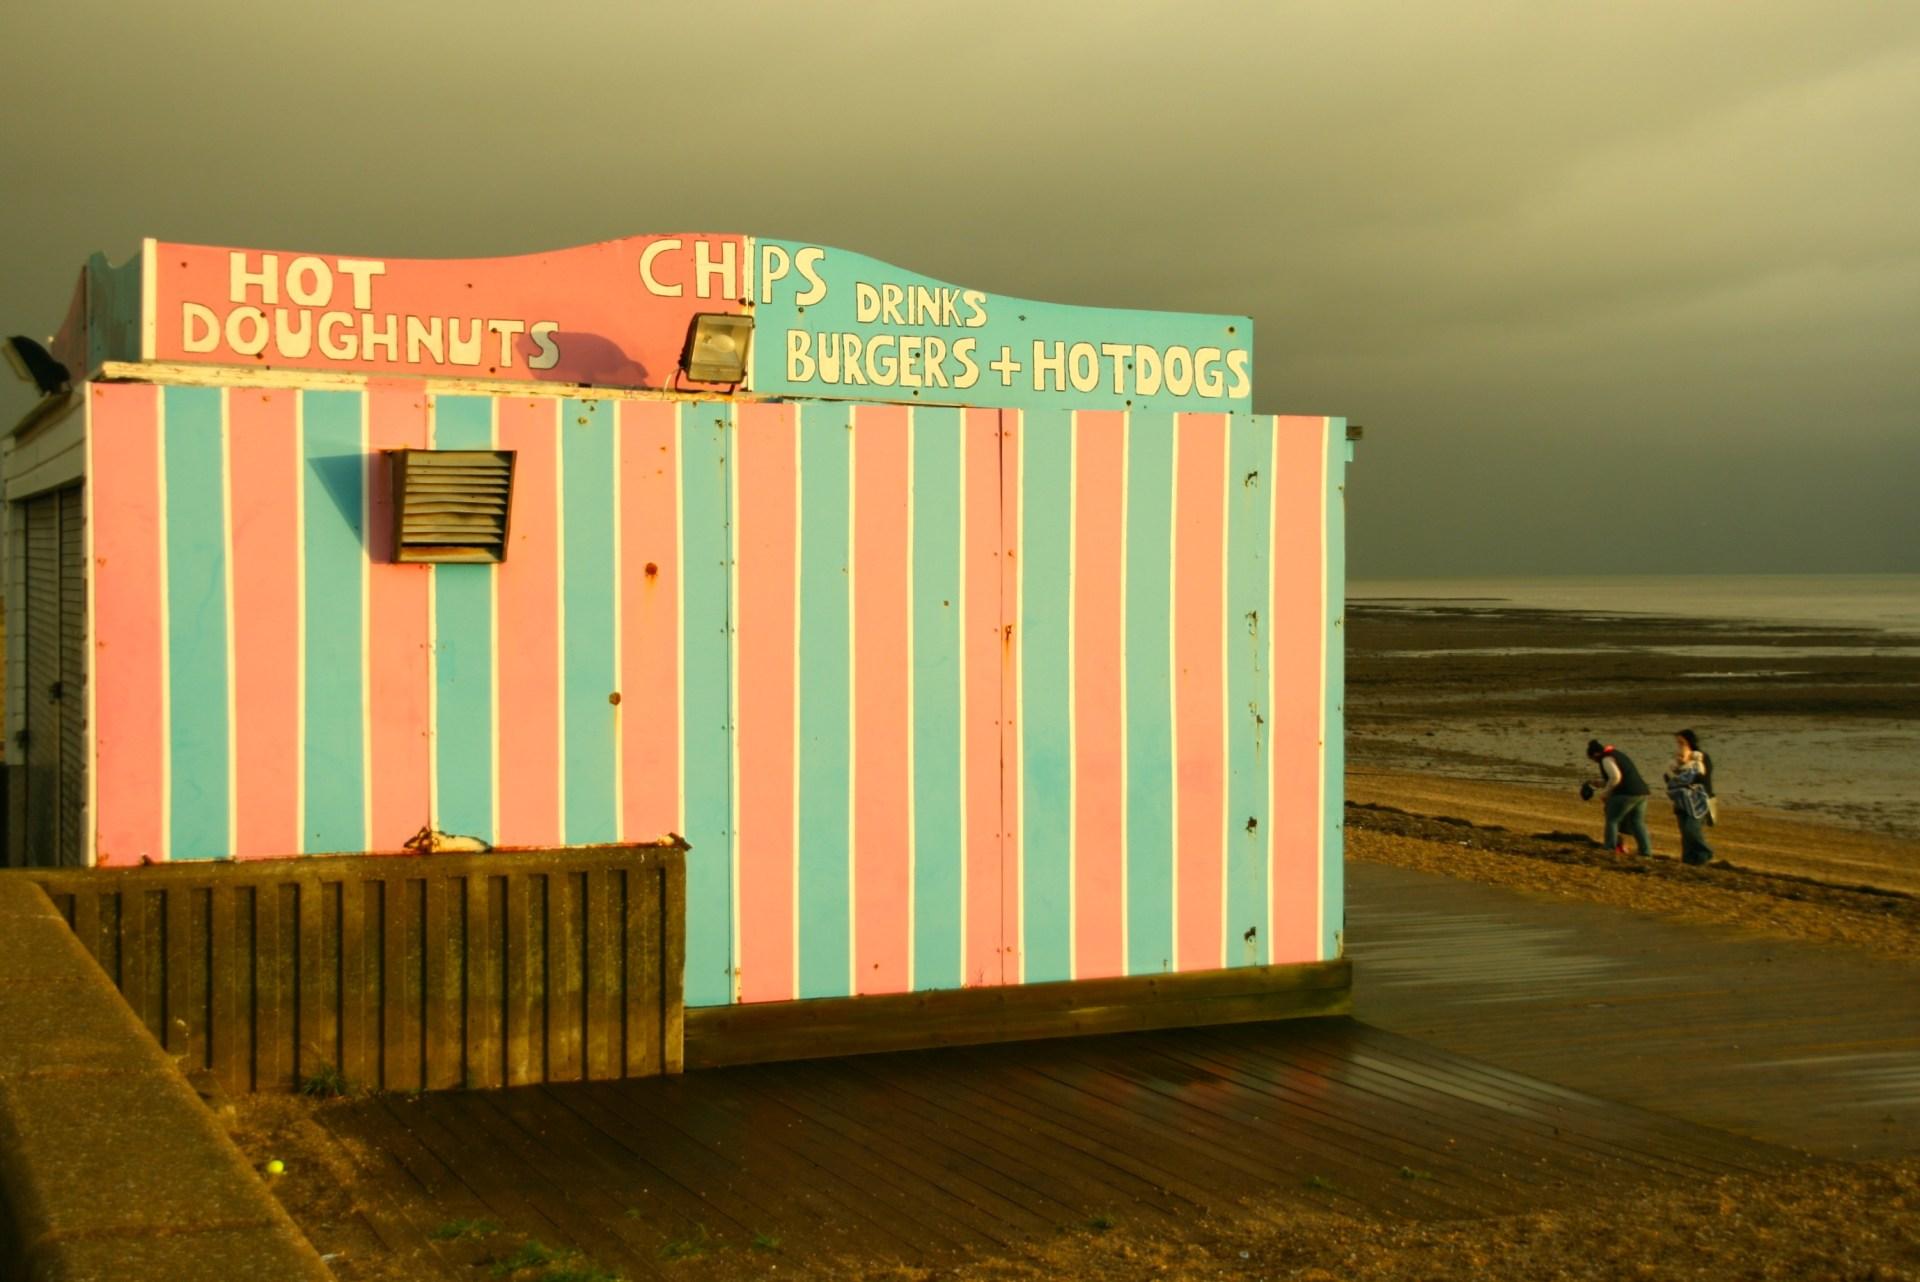 Street food kiosks on Southend beach in Essex